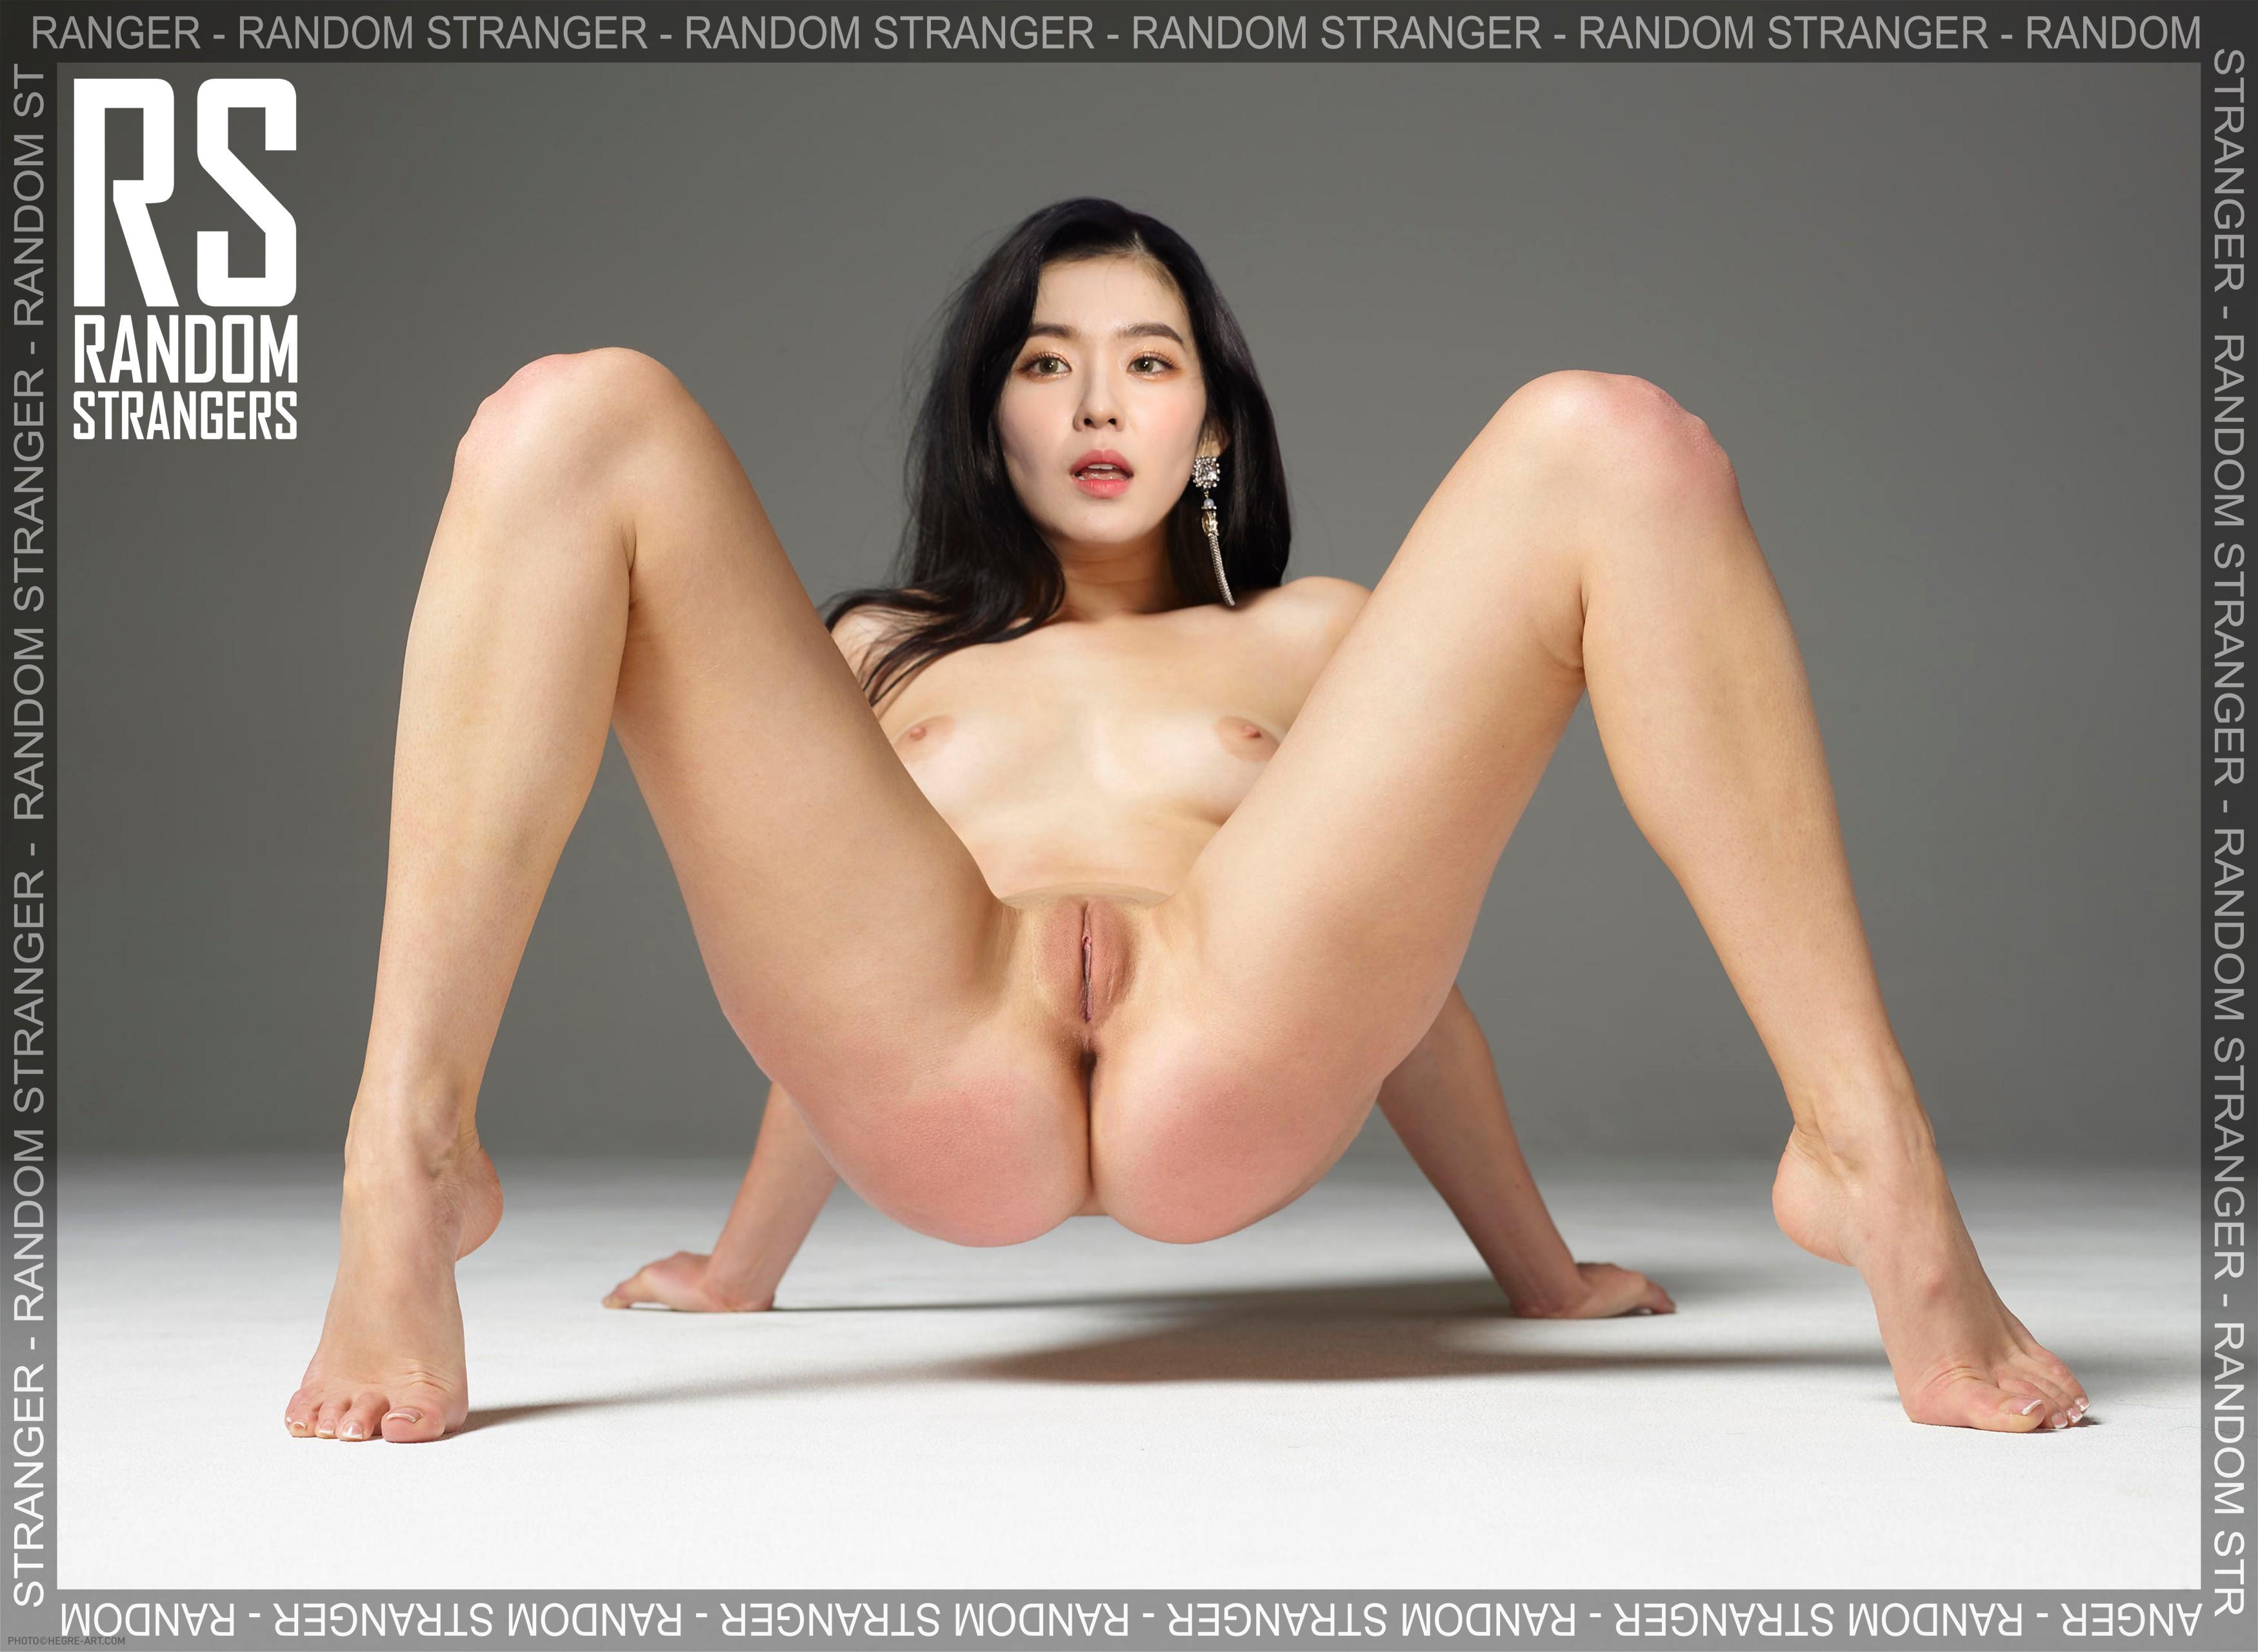 eyefakes.com irene irene idol eyefakes nude